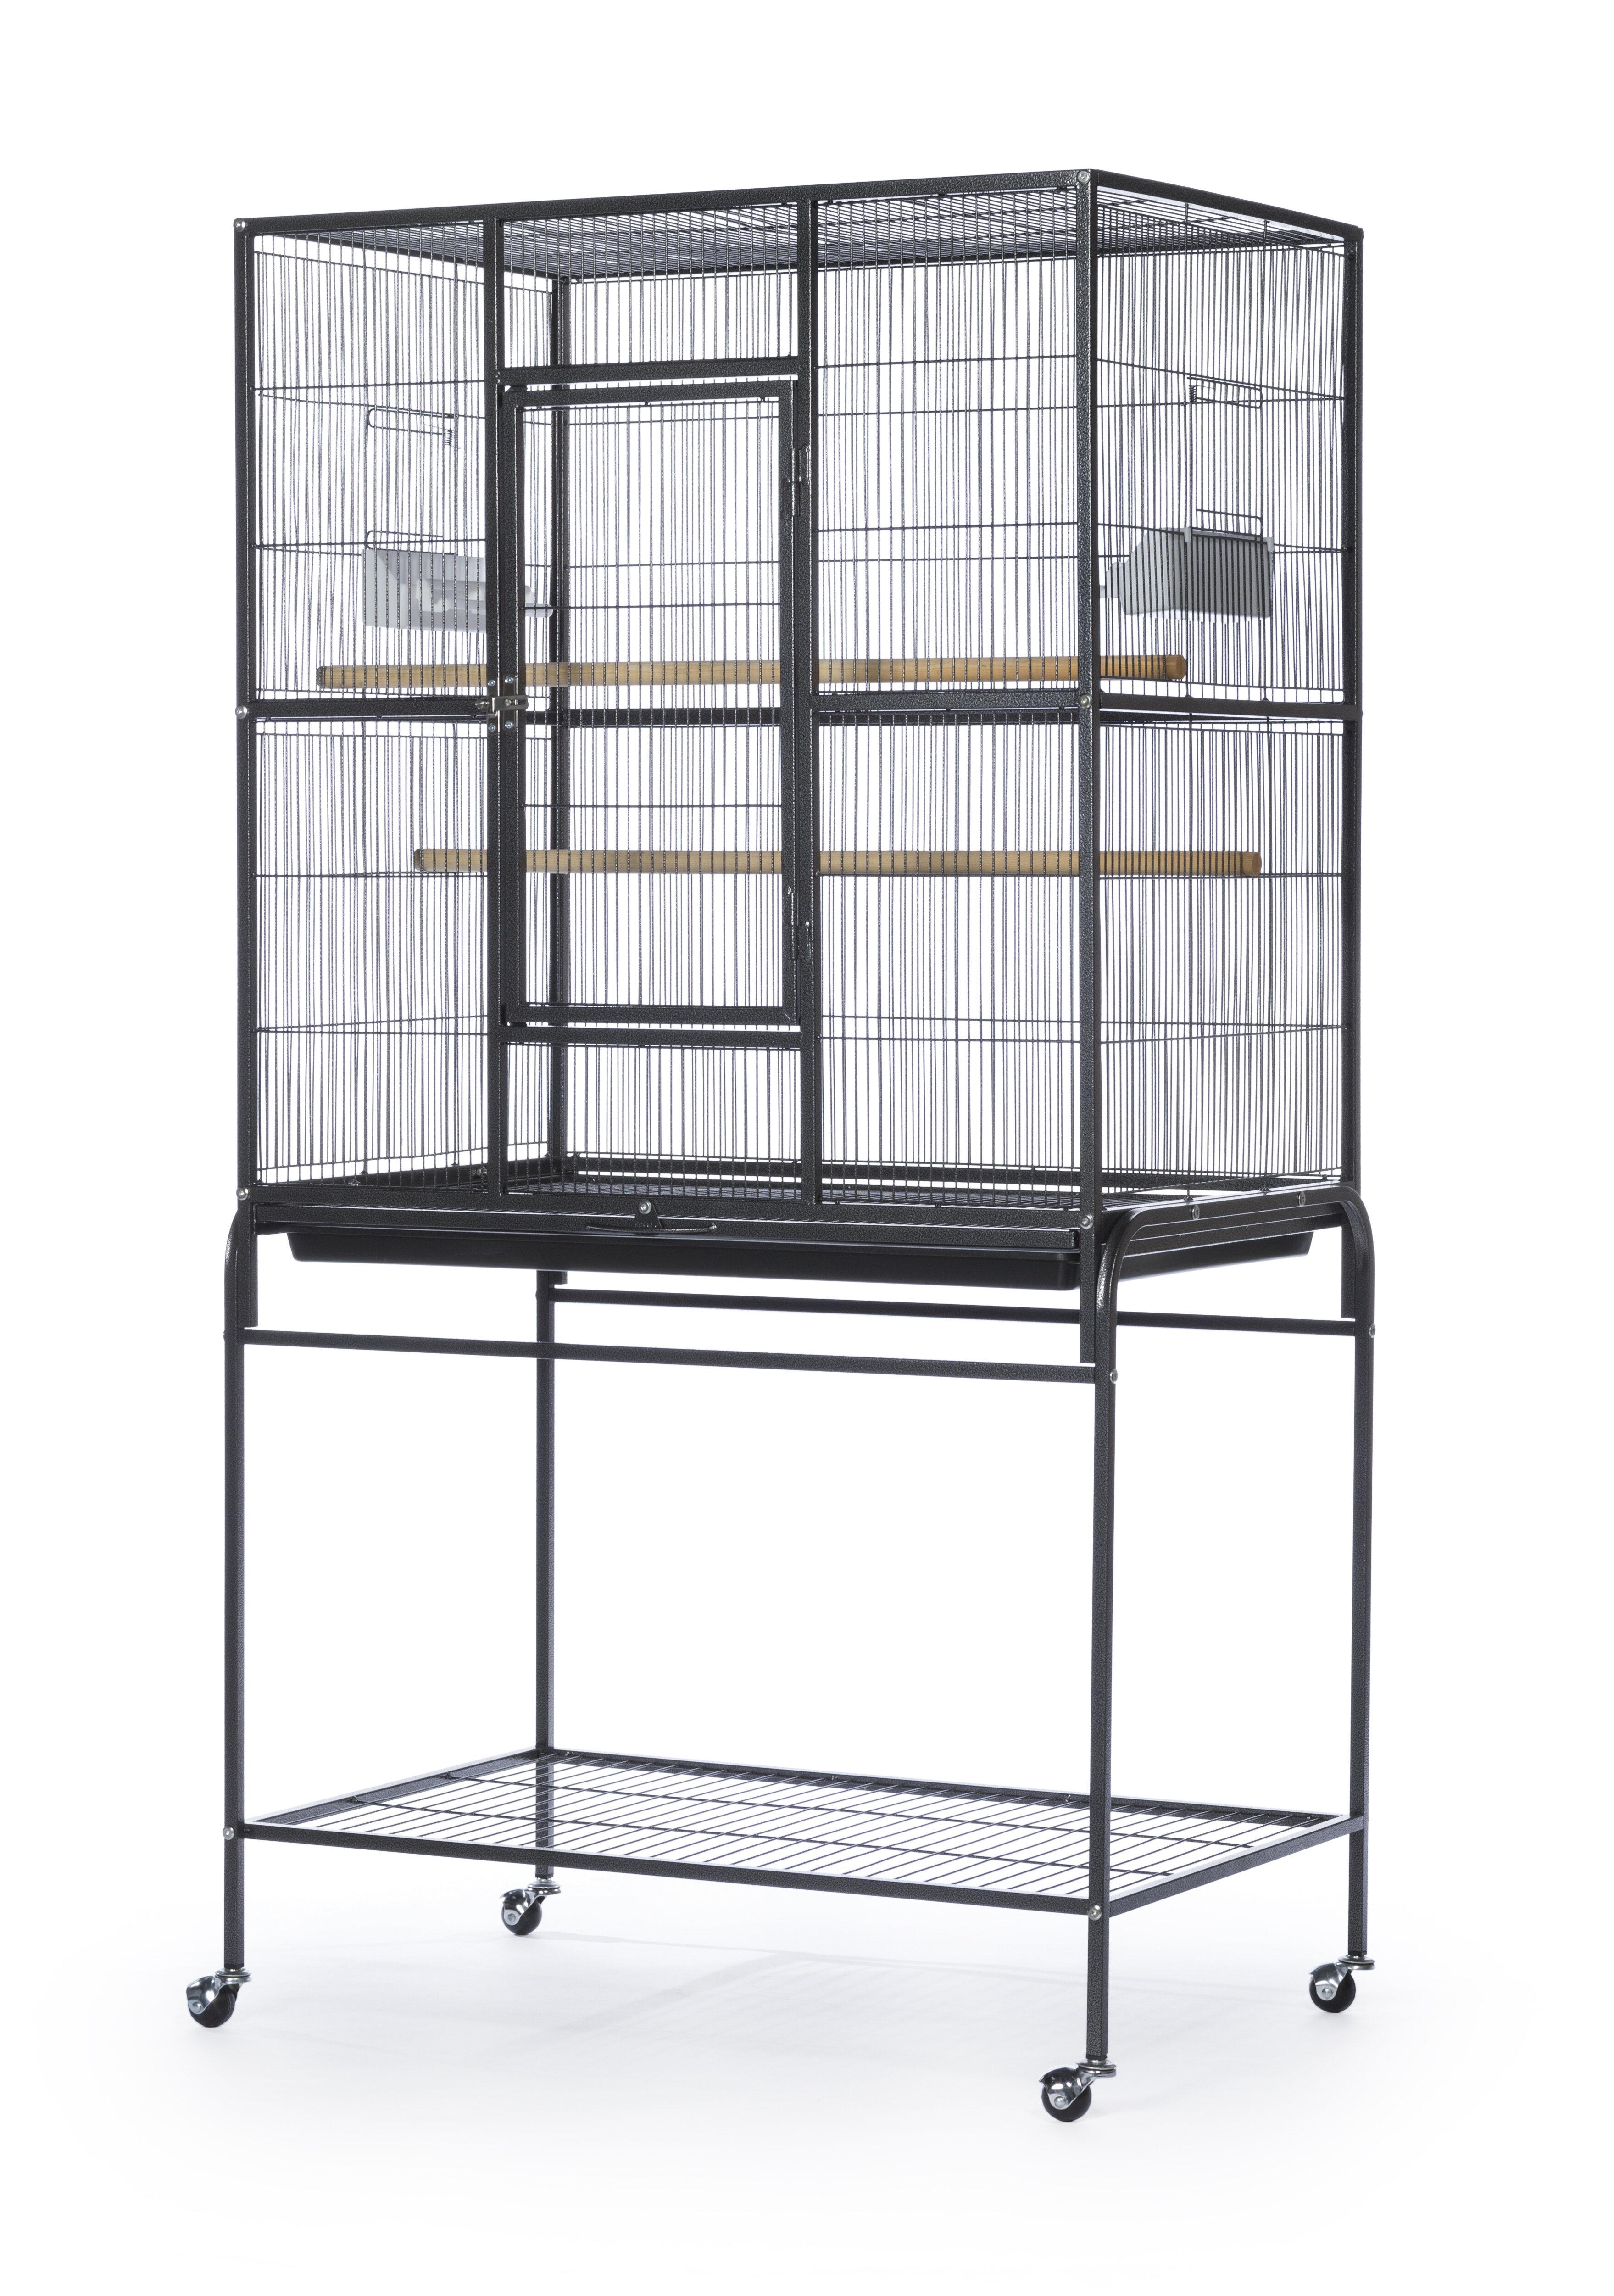 Black Parakeet Bird Cages You Ll Love In 2021 Wayfair